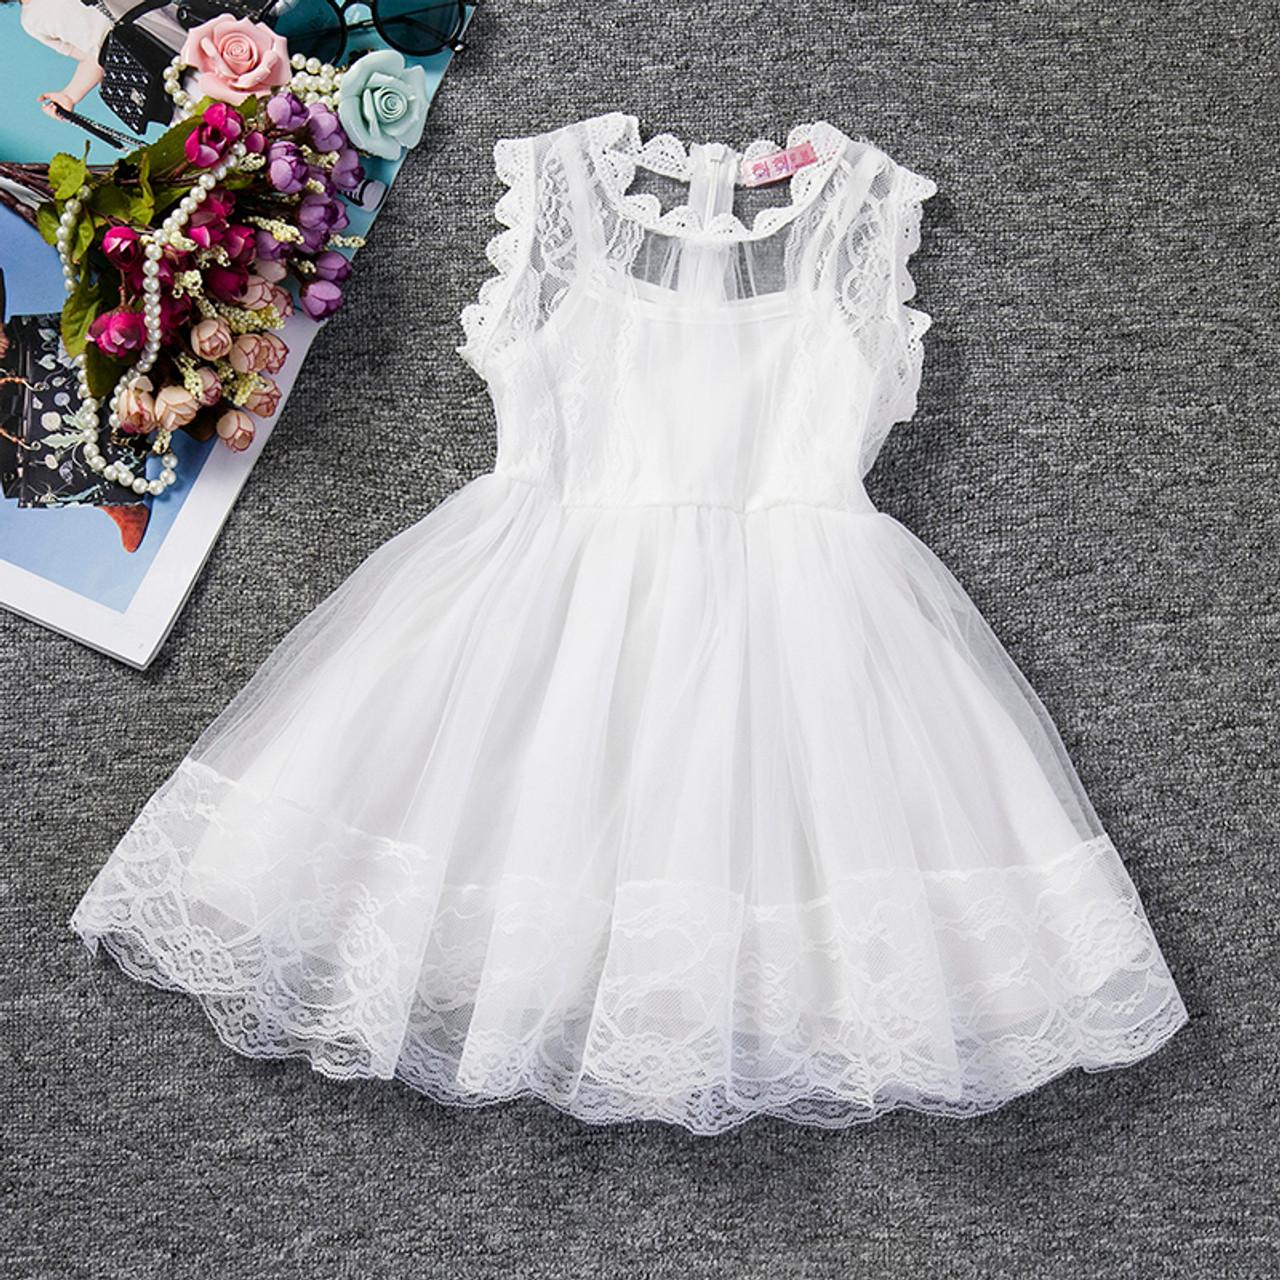 dbb2657b03ab 2018 Baby Girl Floral Lace Princess Tutu Dress Wedding Christening ...